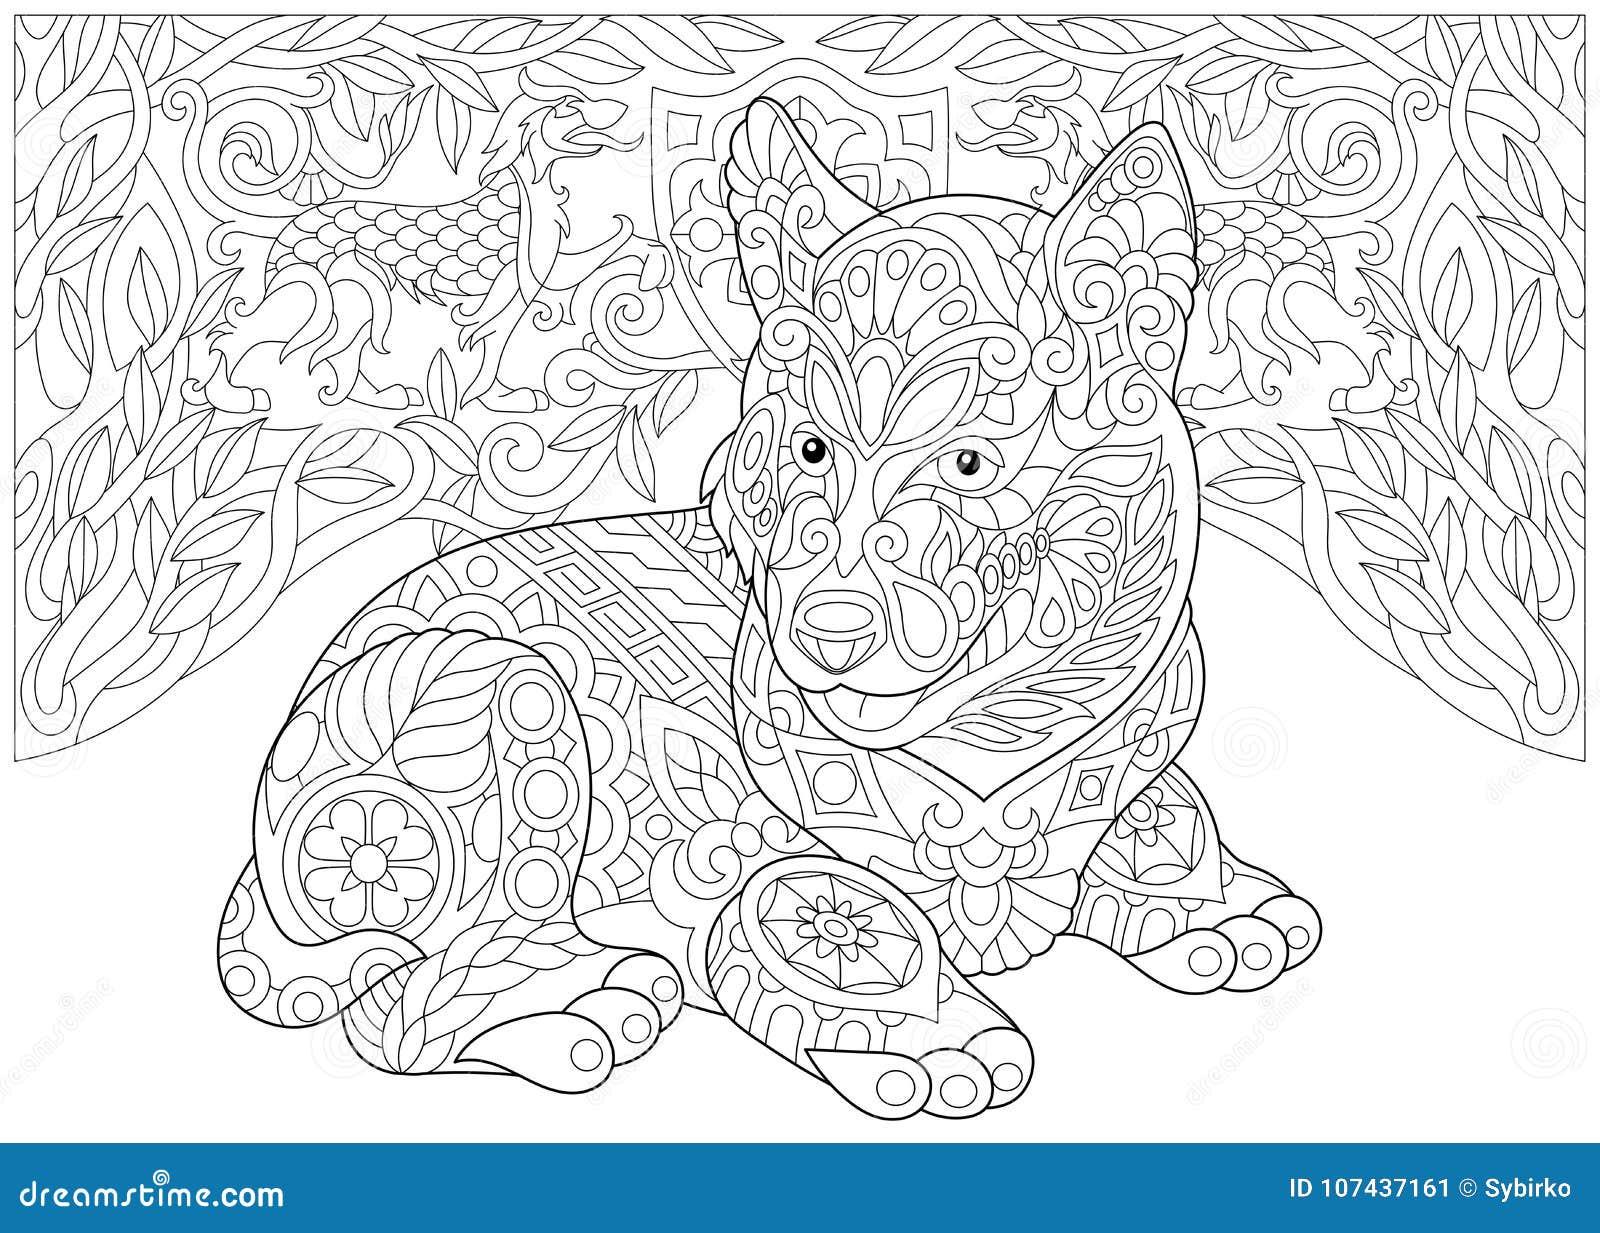 Zentangle Siberian Husky And Heraldic Dogs Stock Vector ...